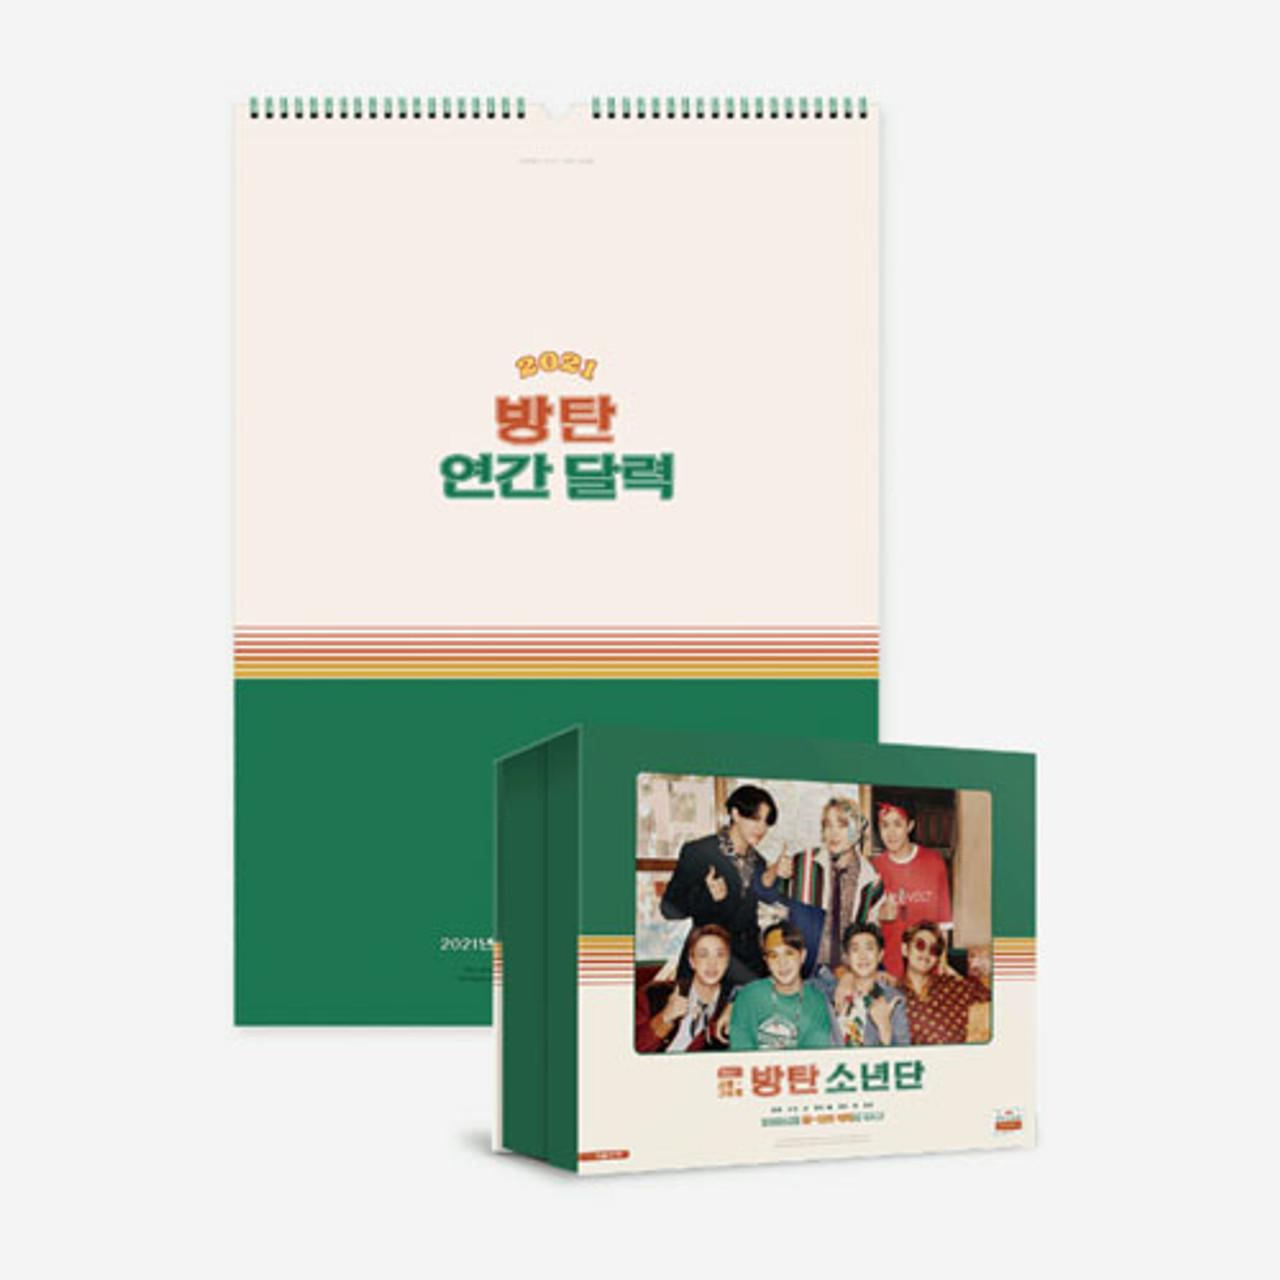 kpop group calendar and DVD package